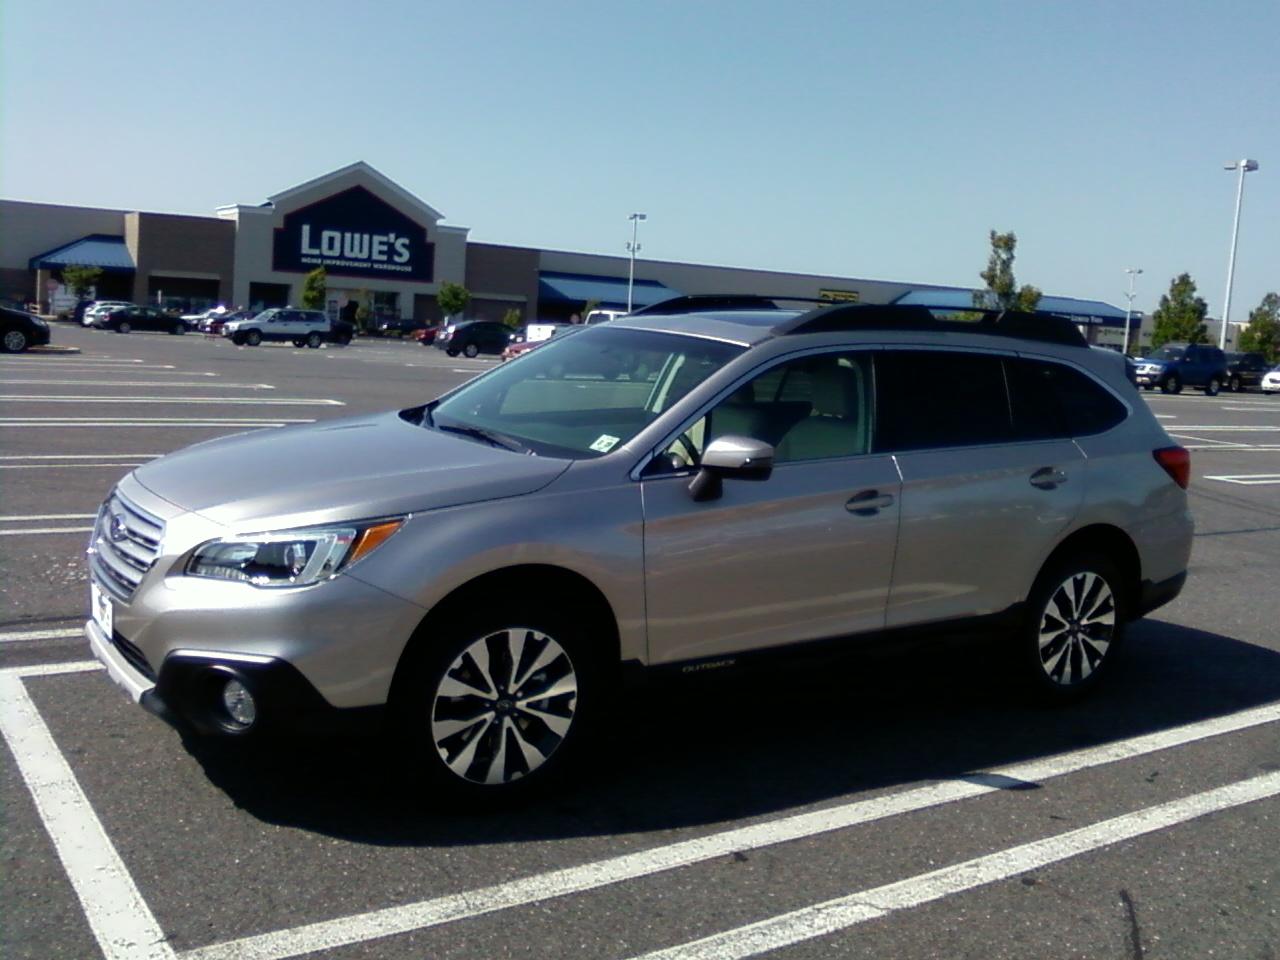 vs. Burnished Bronze Metallic - Subaru Outback - Subaru Outback Forums